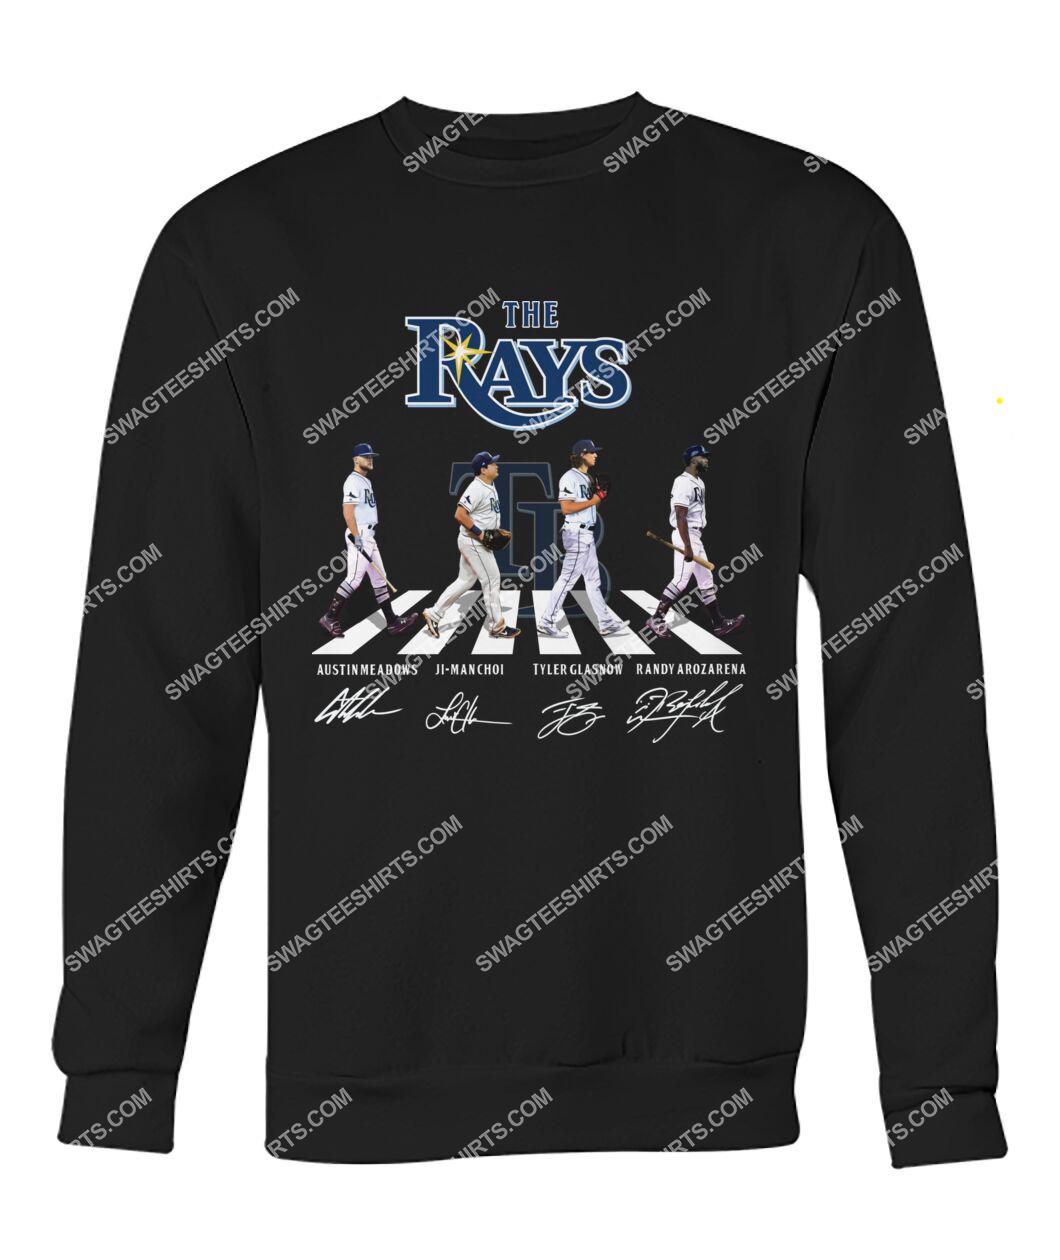 the tampa bay rays walking abbey road sweatshirt 1